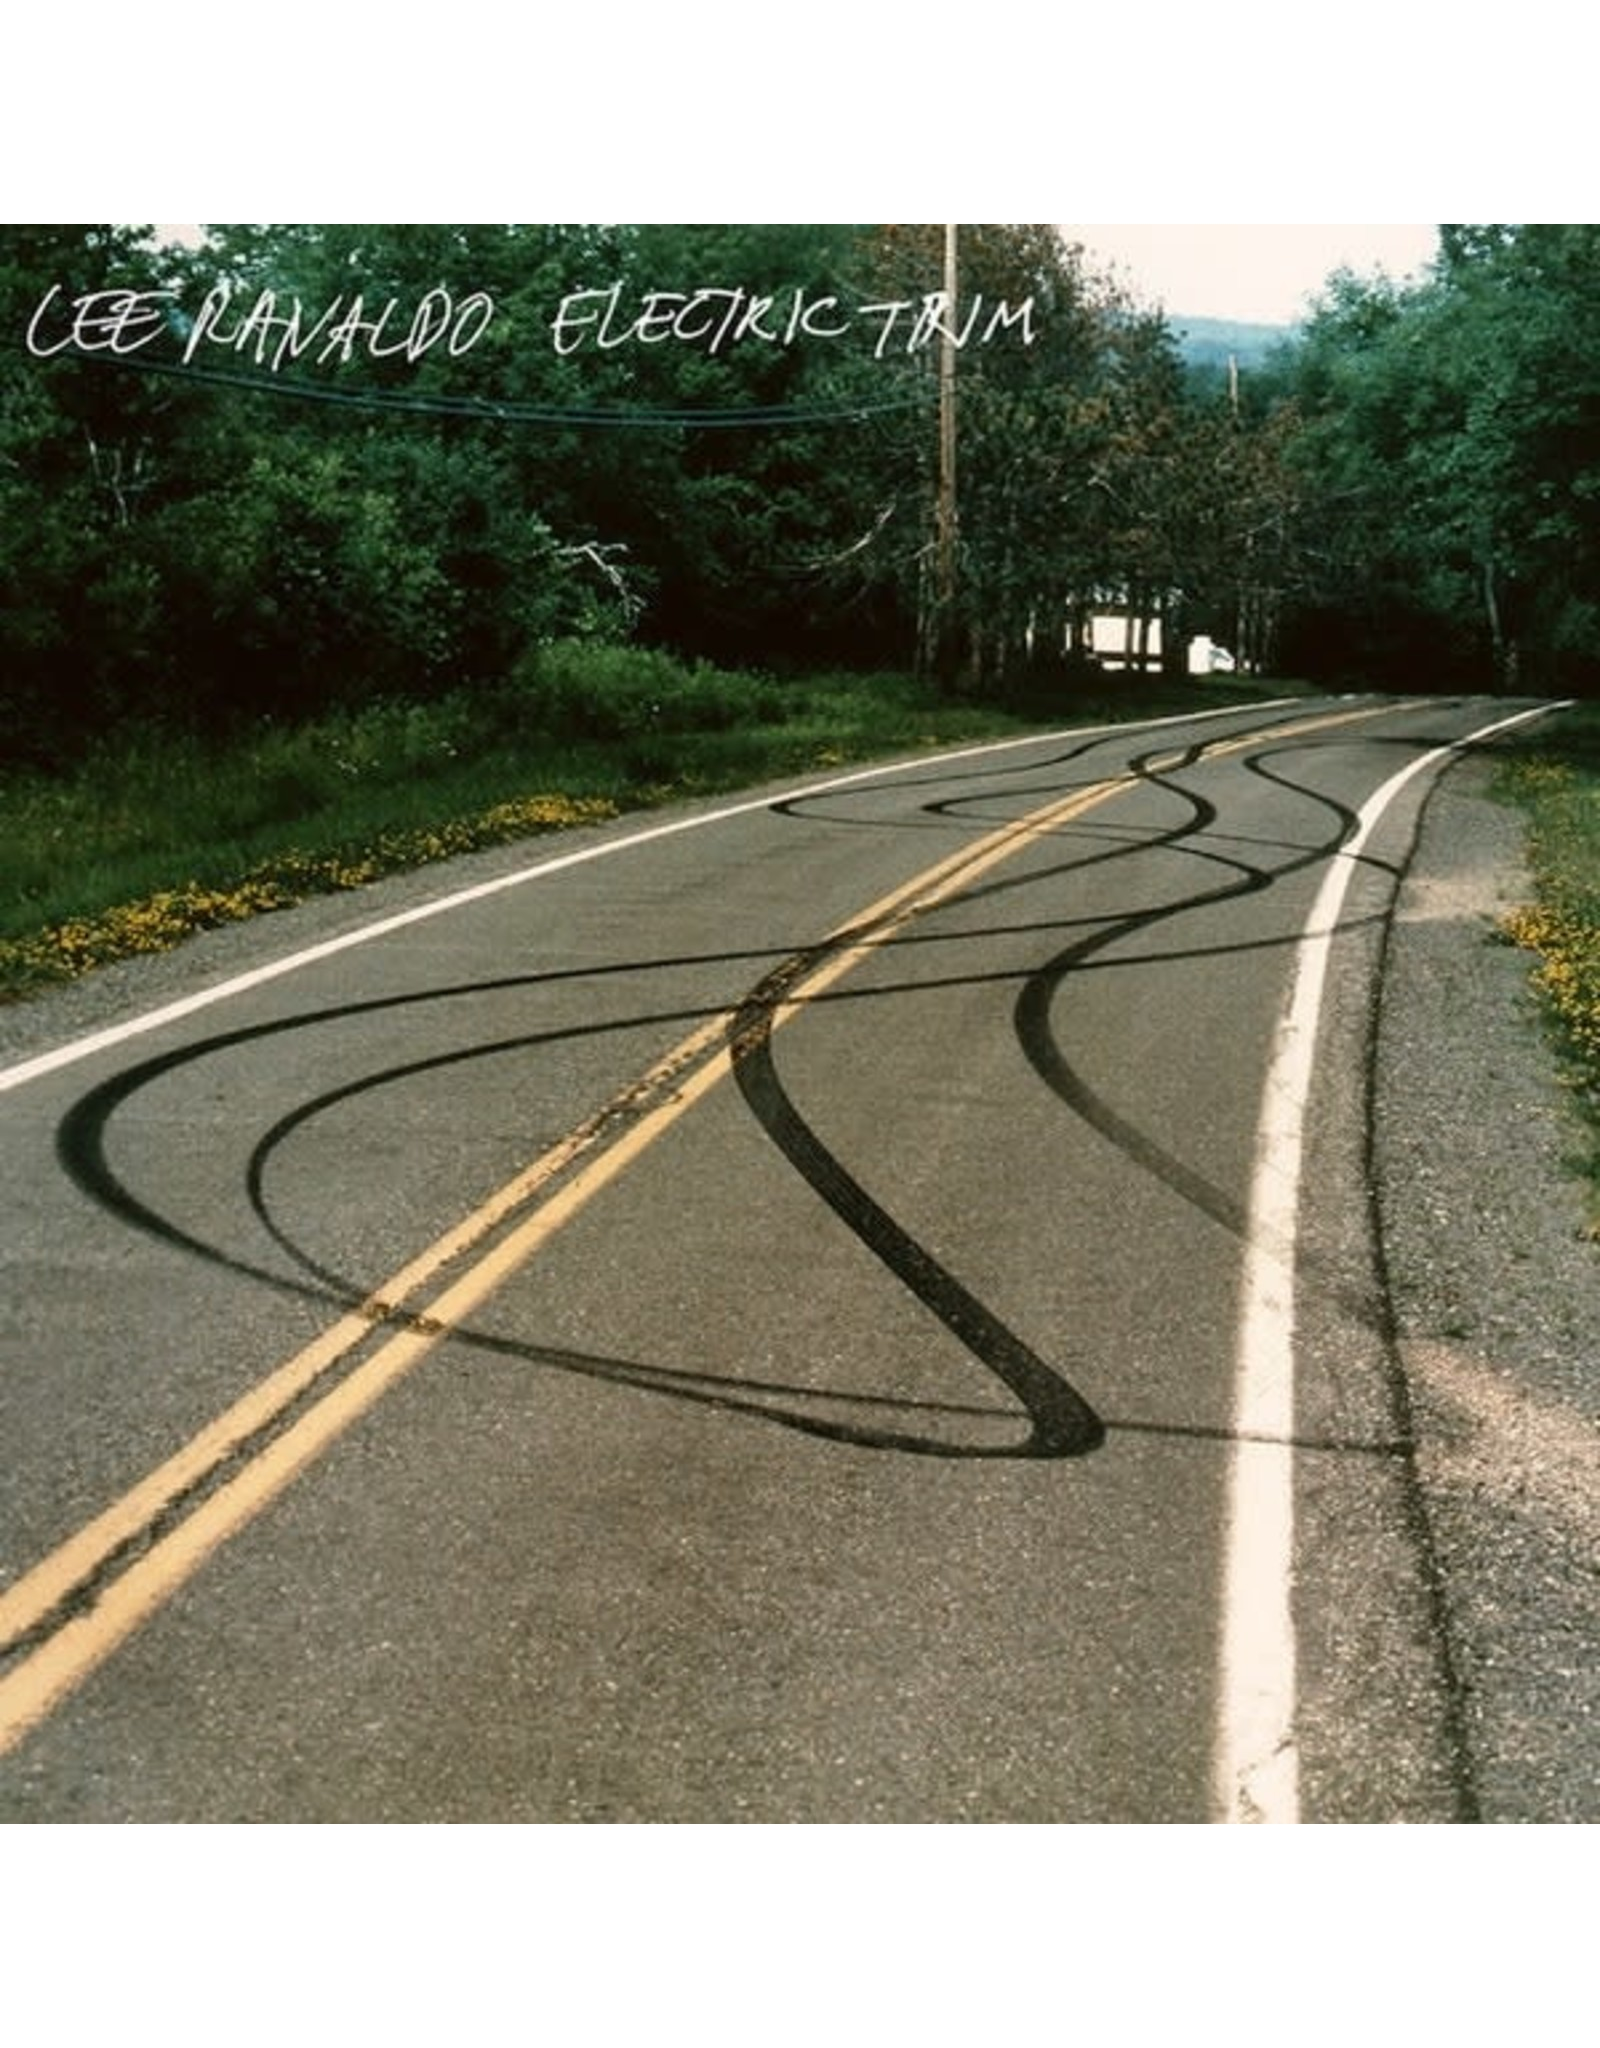 Ranaldo, Leo - Electric Trim CD